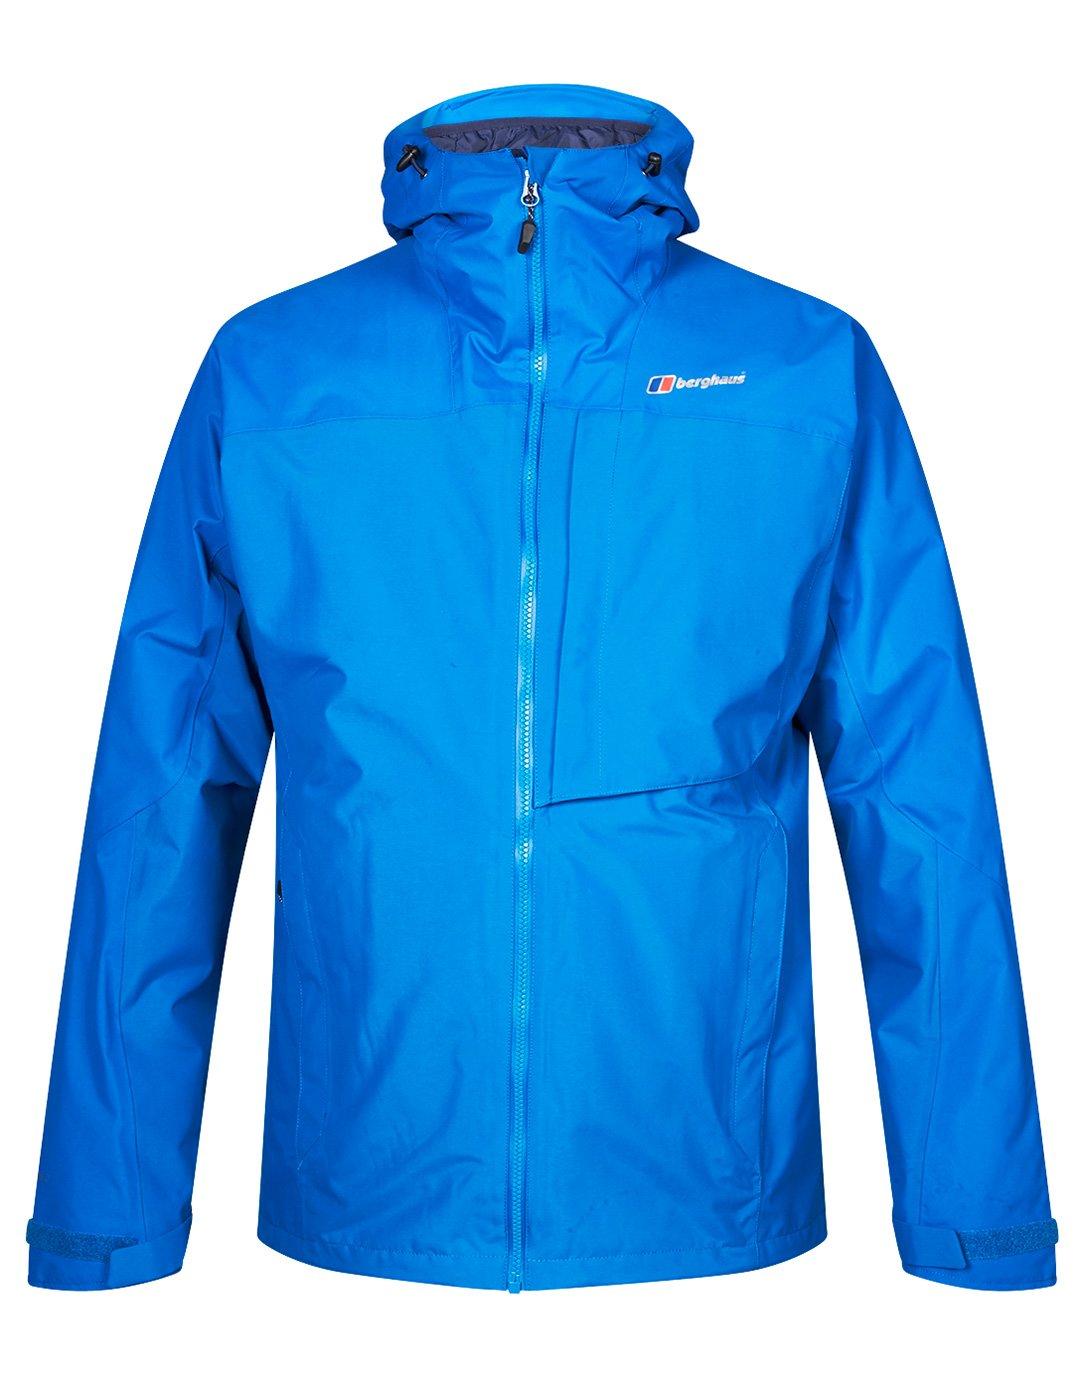 Berghaus Veste 3 en 1 Homme Ben Alder 3-In-1 Snorkel bleu rouge Dahlia XL